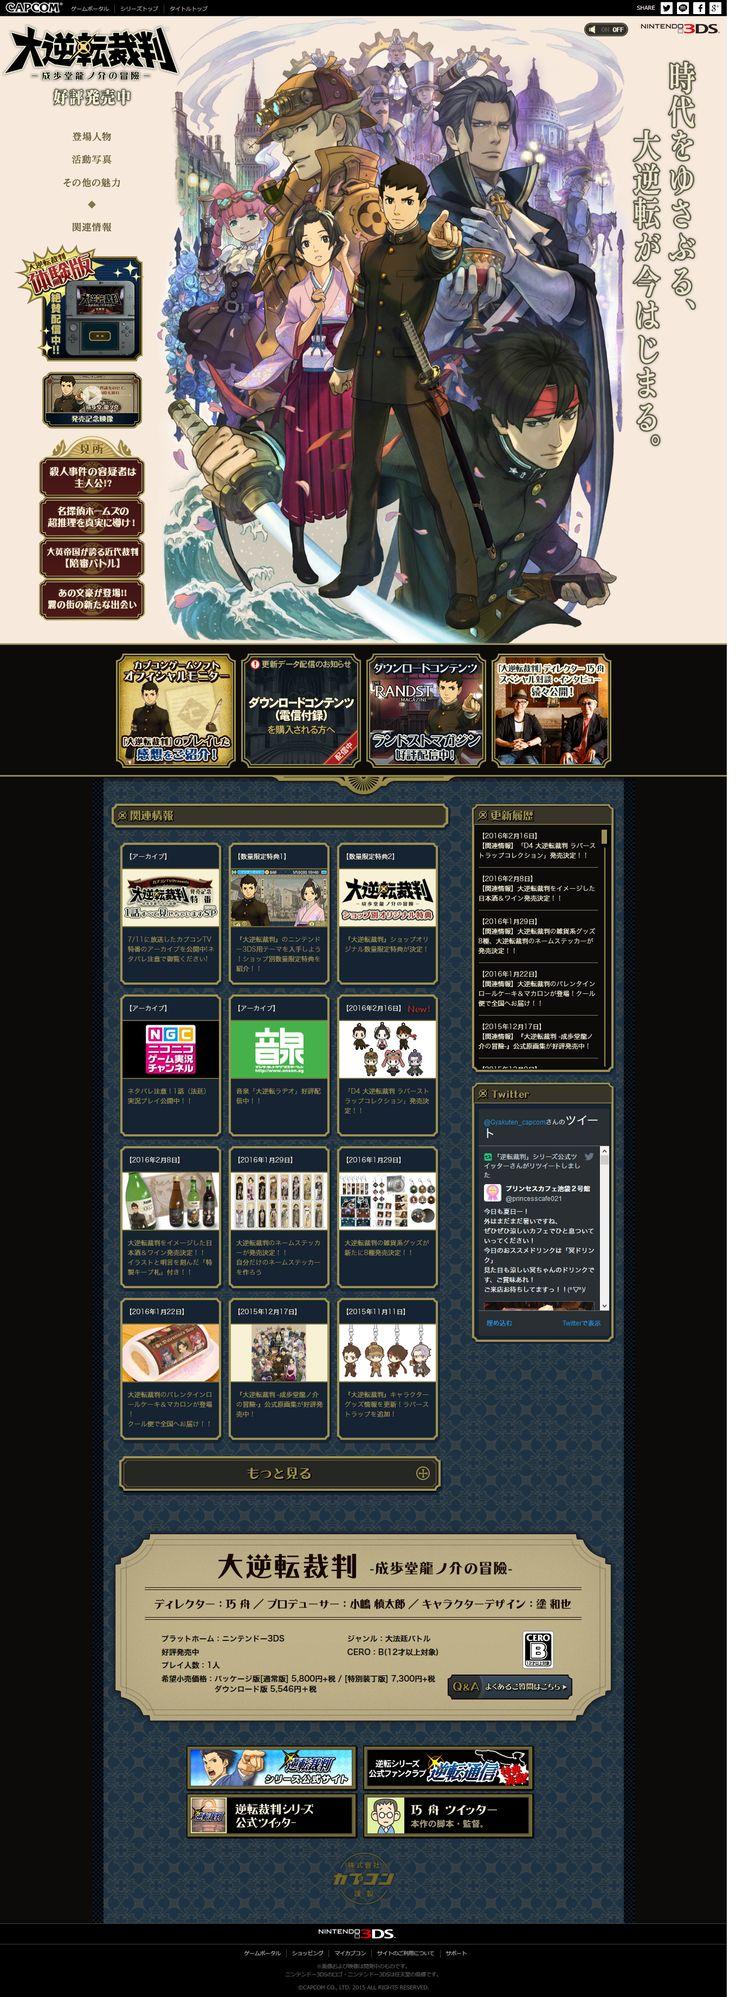 DAIGYAKUTENSAIBAN(Japanese) #WebDesign